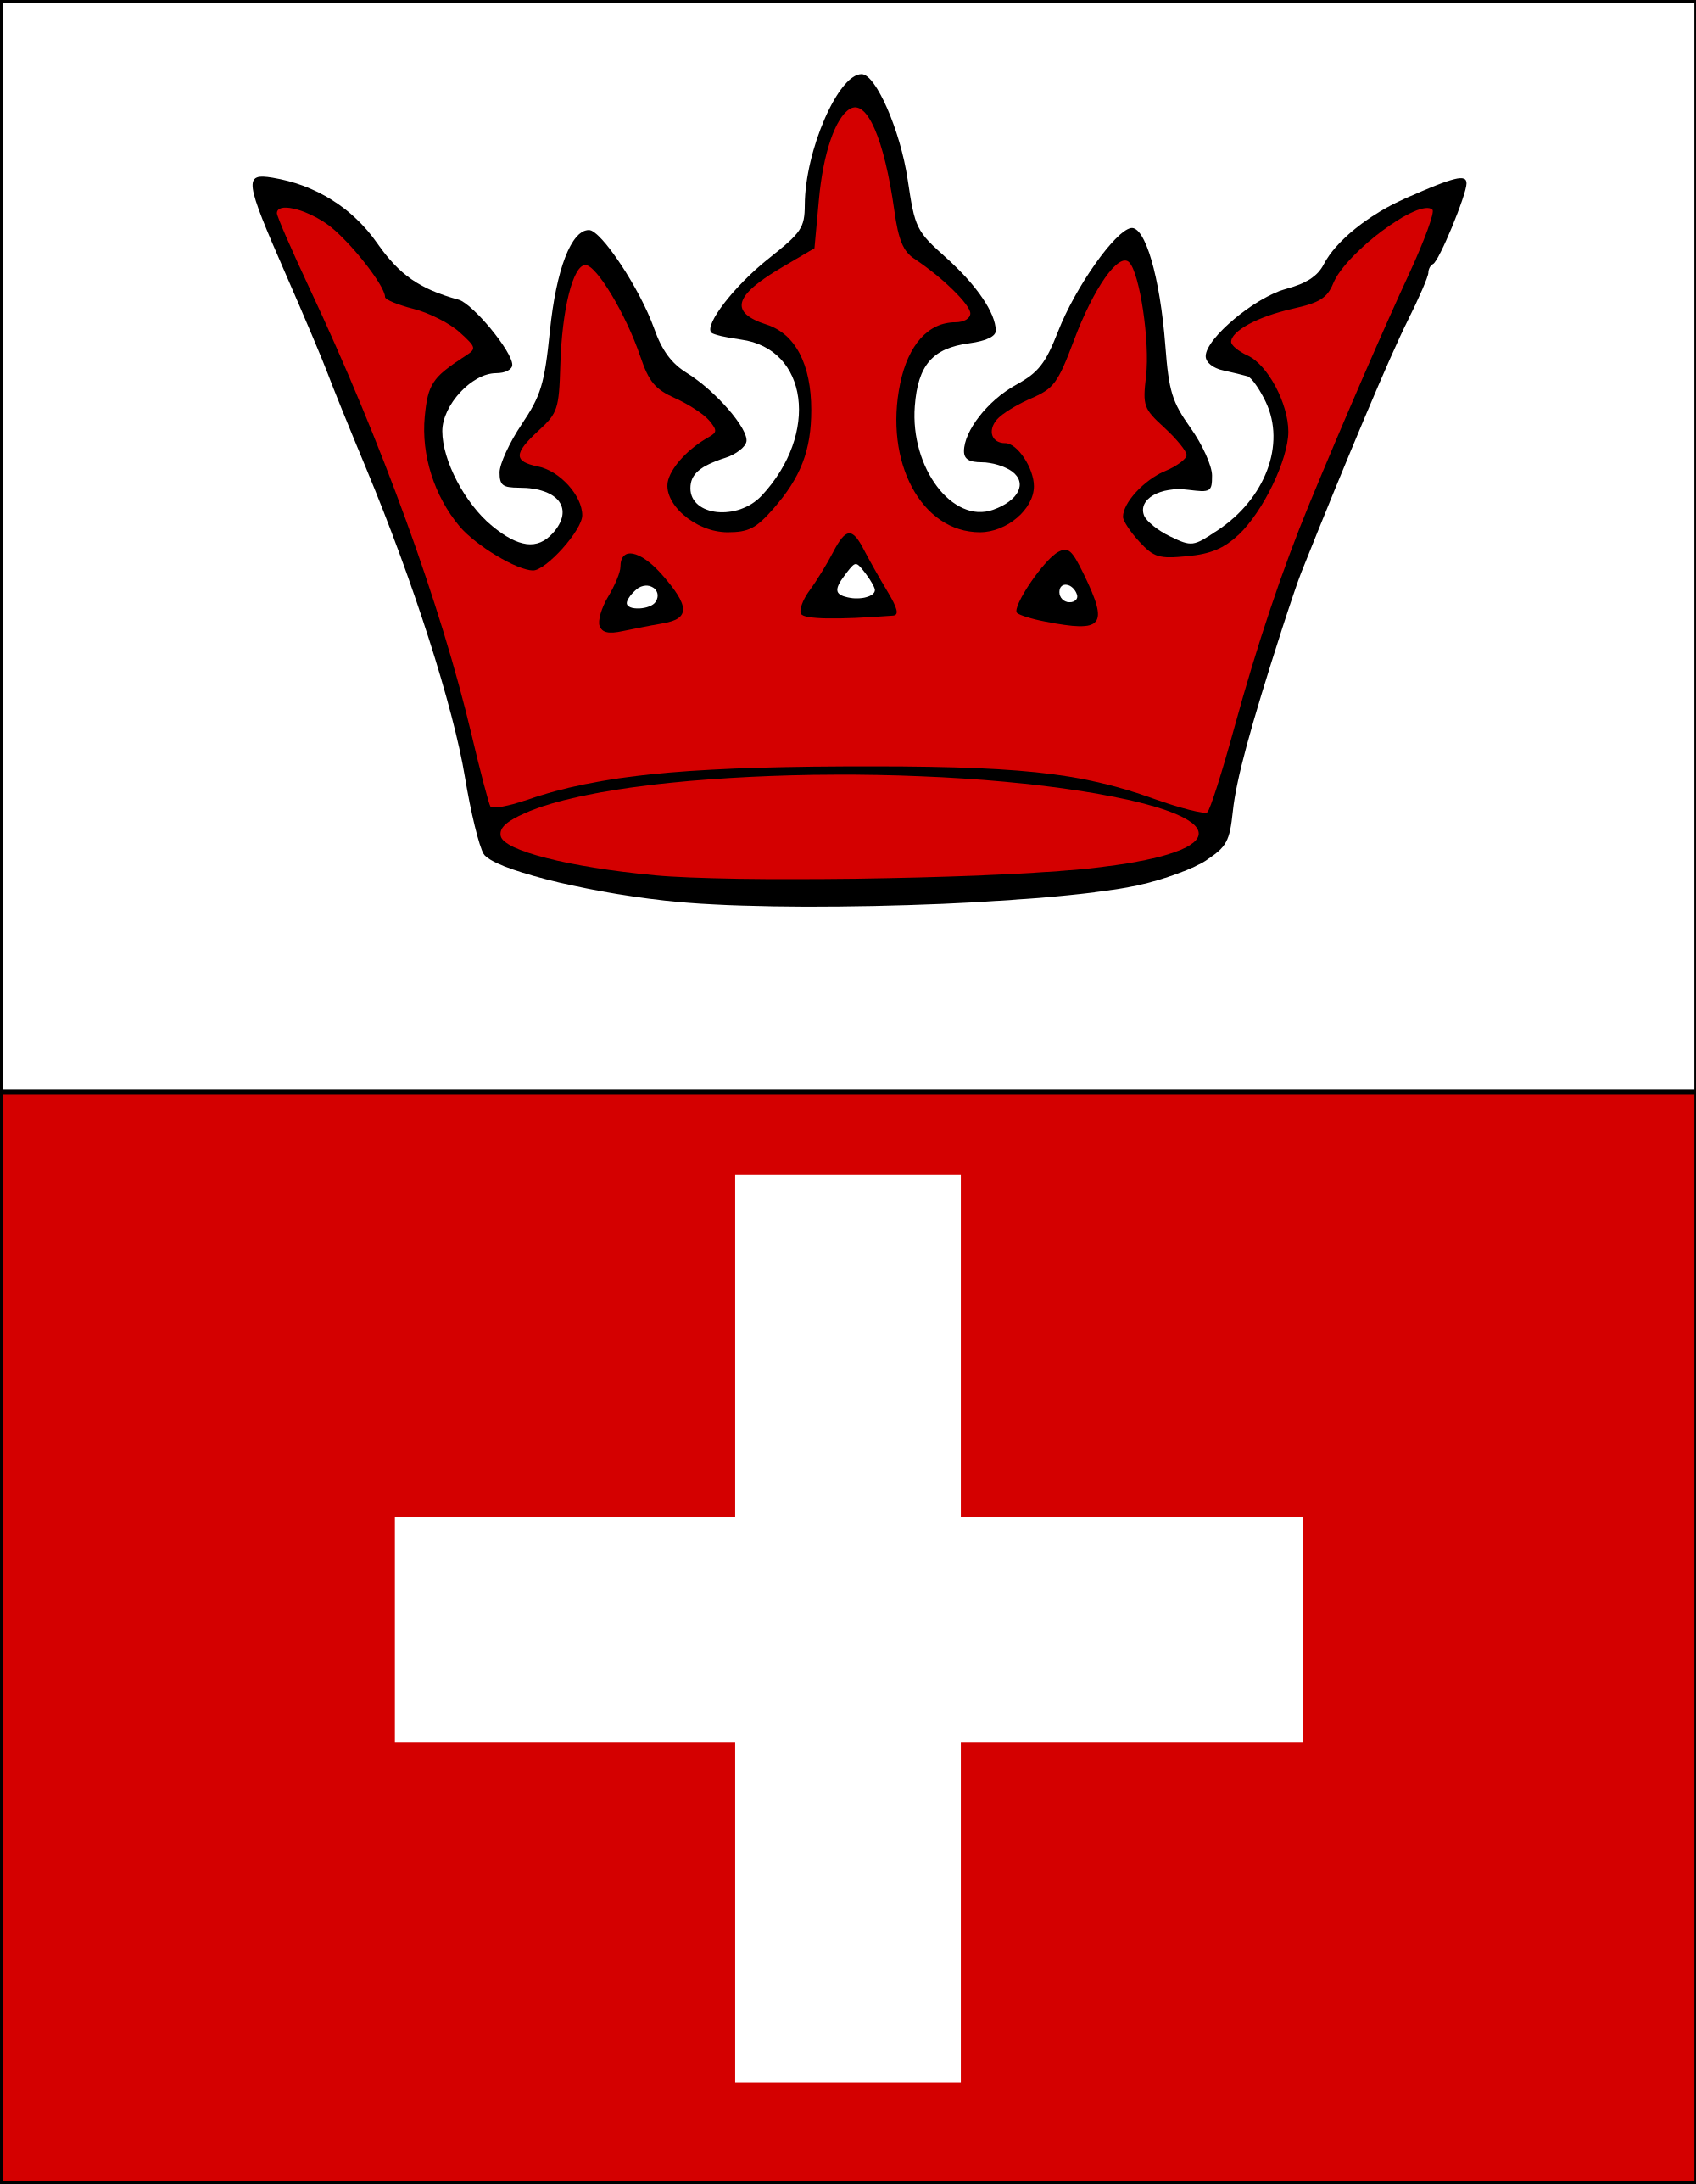 File:Grunwald Królewiec stare miasto.svg.